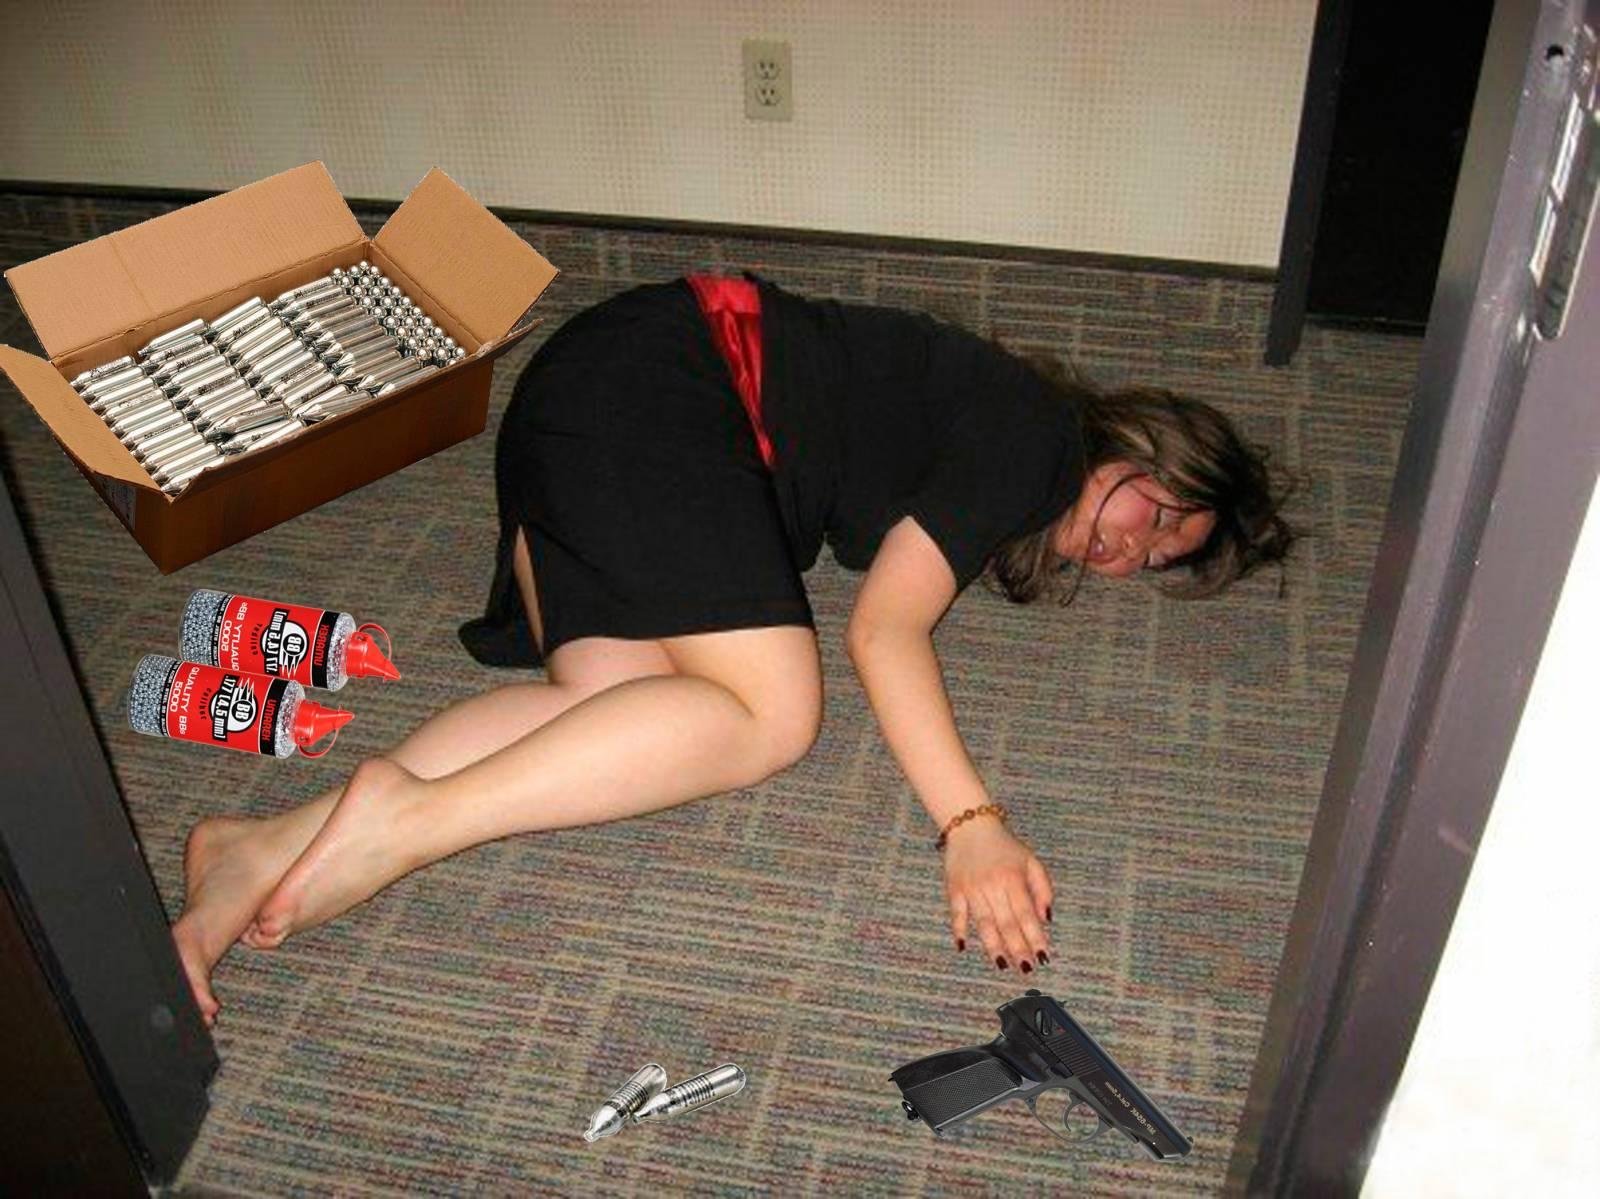 Пьяная хозяйка квартиры 13 фотография